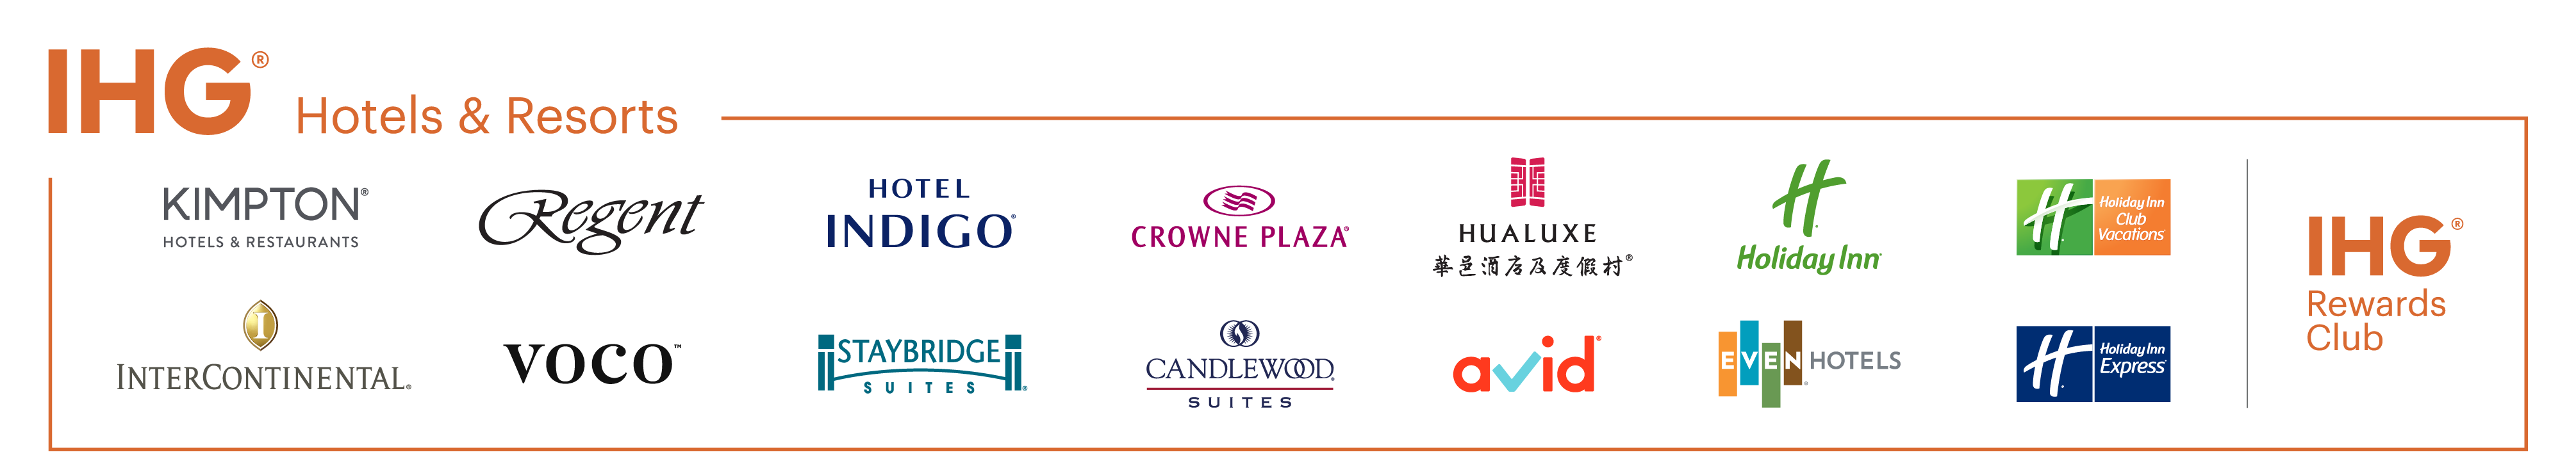 IHG Hotels & Resorts logos